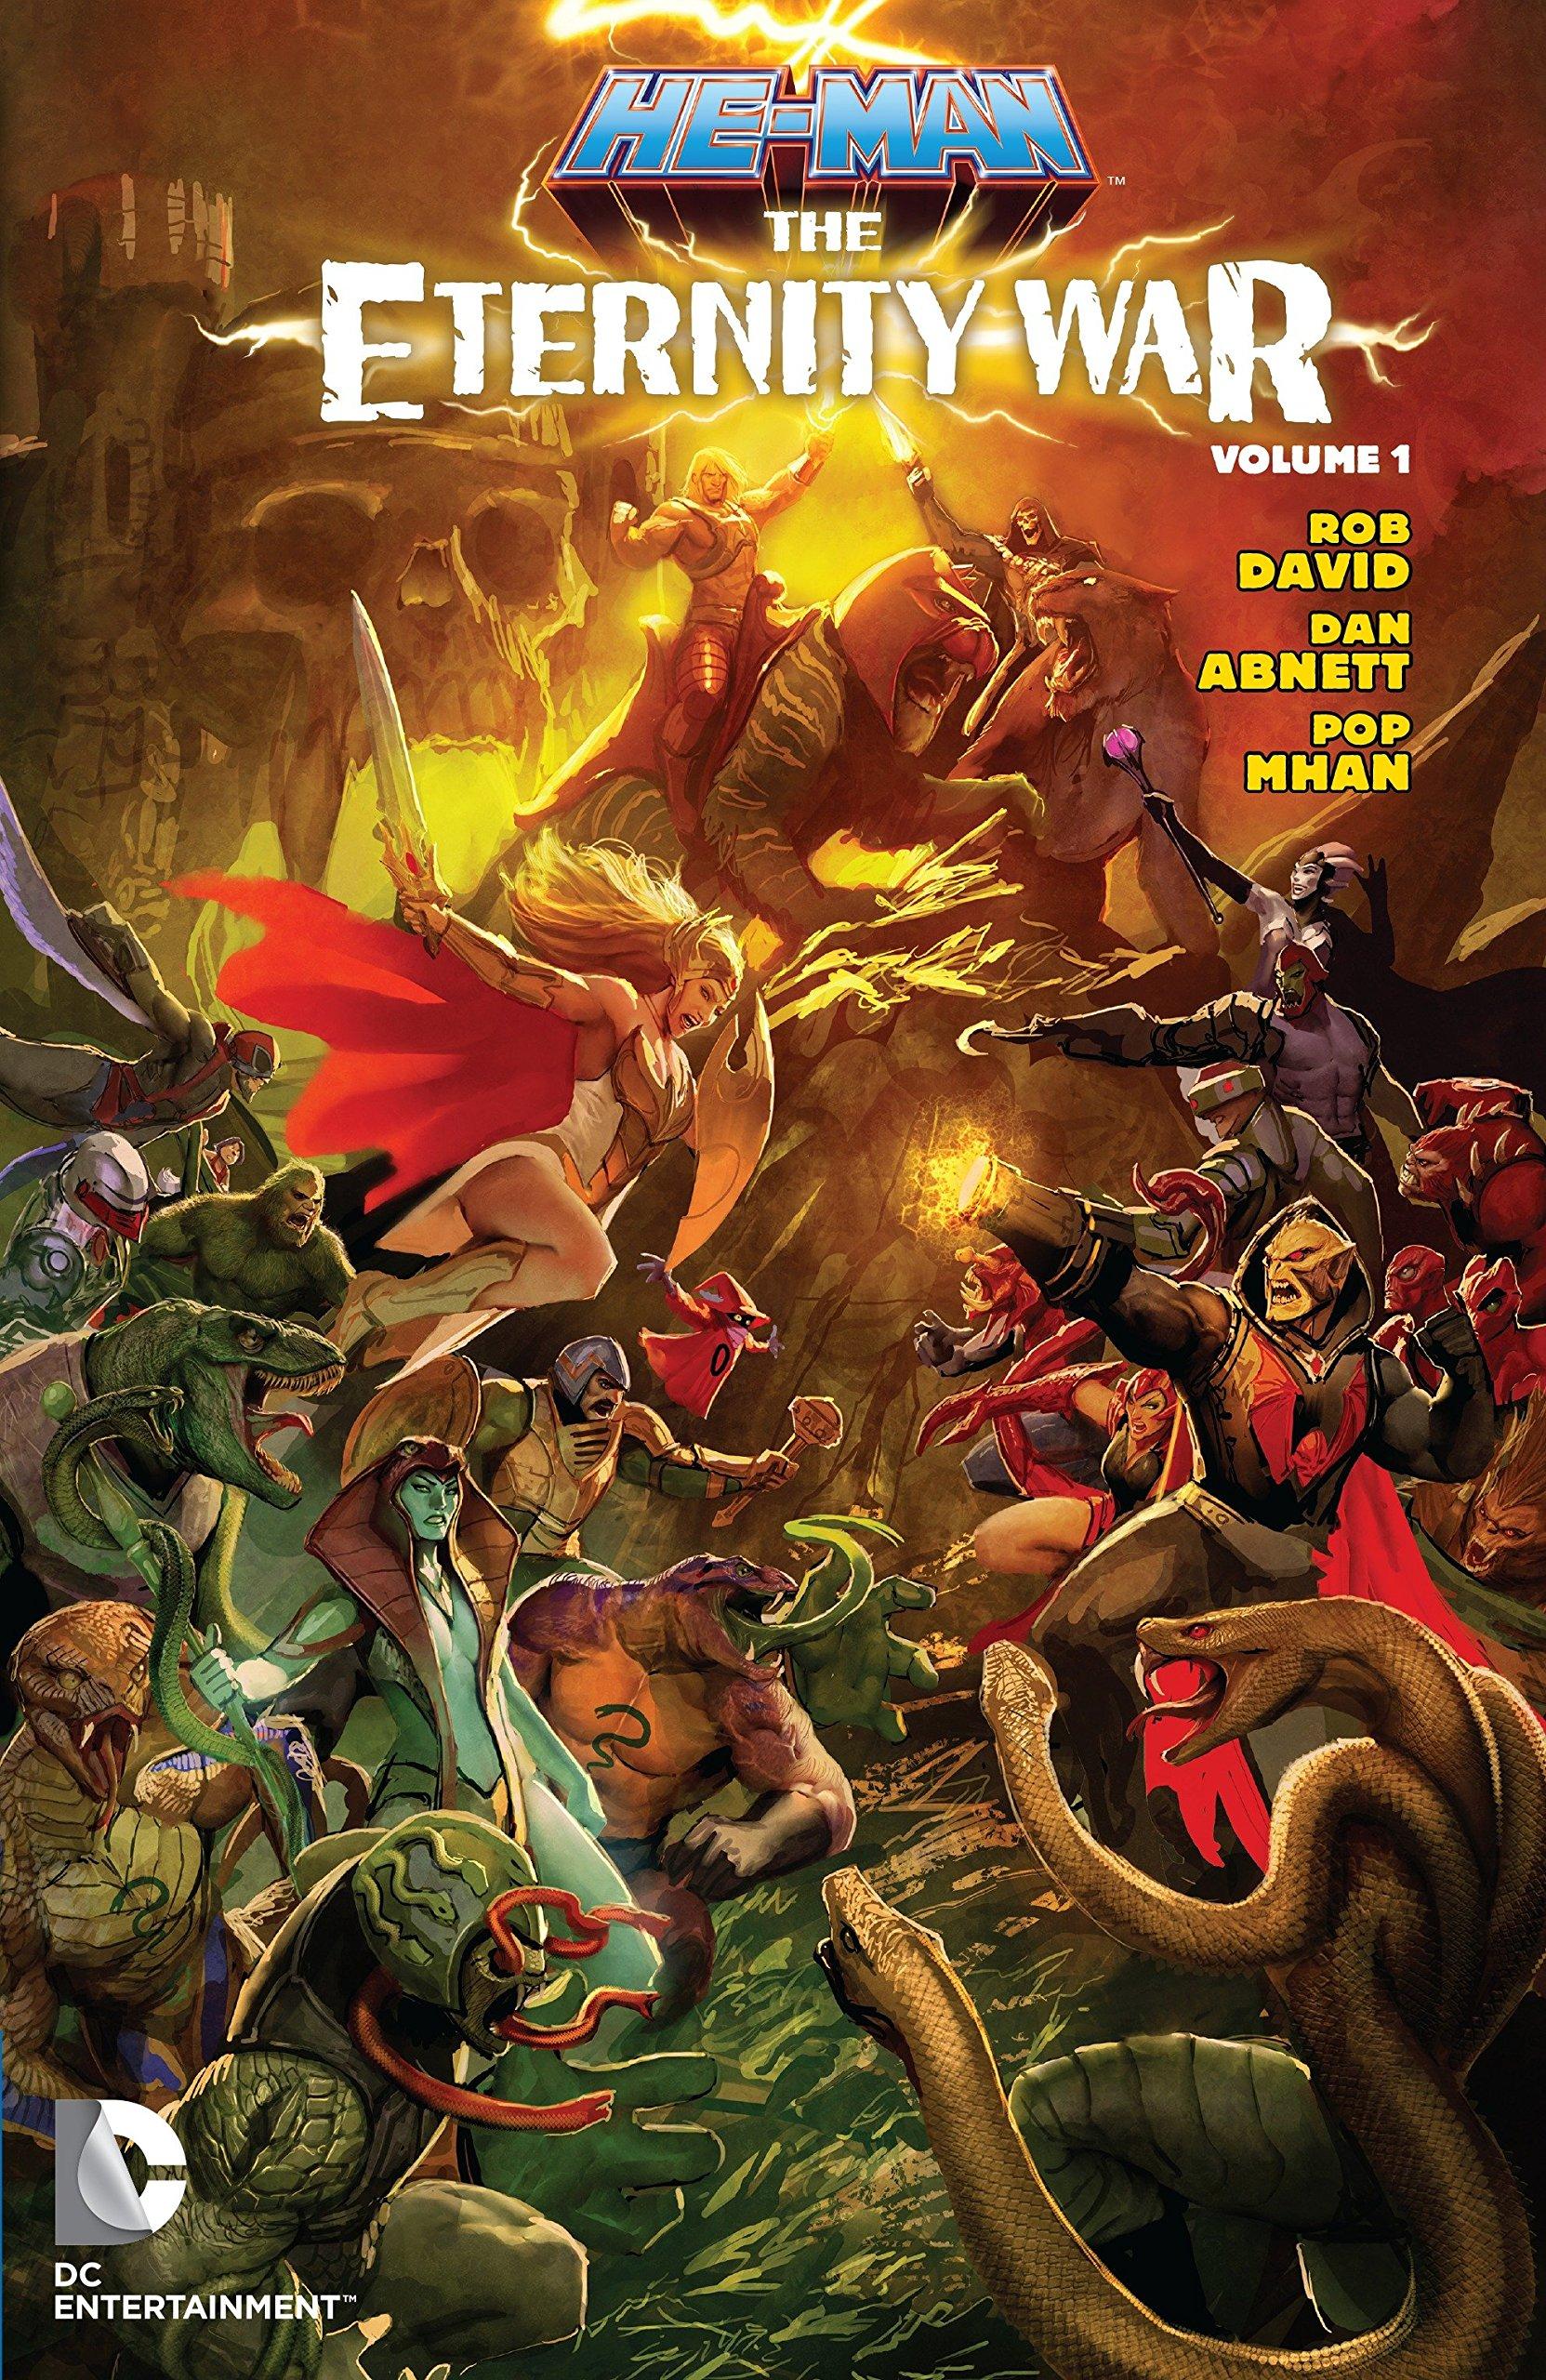 He-Man: The Eternity War Vol. 1 ebook